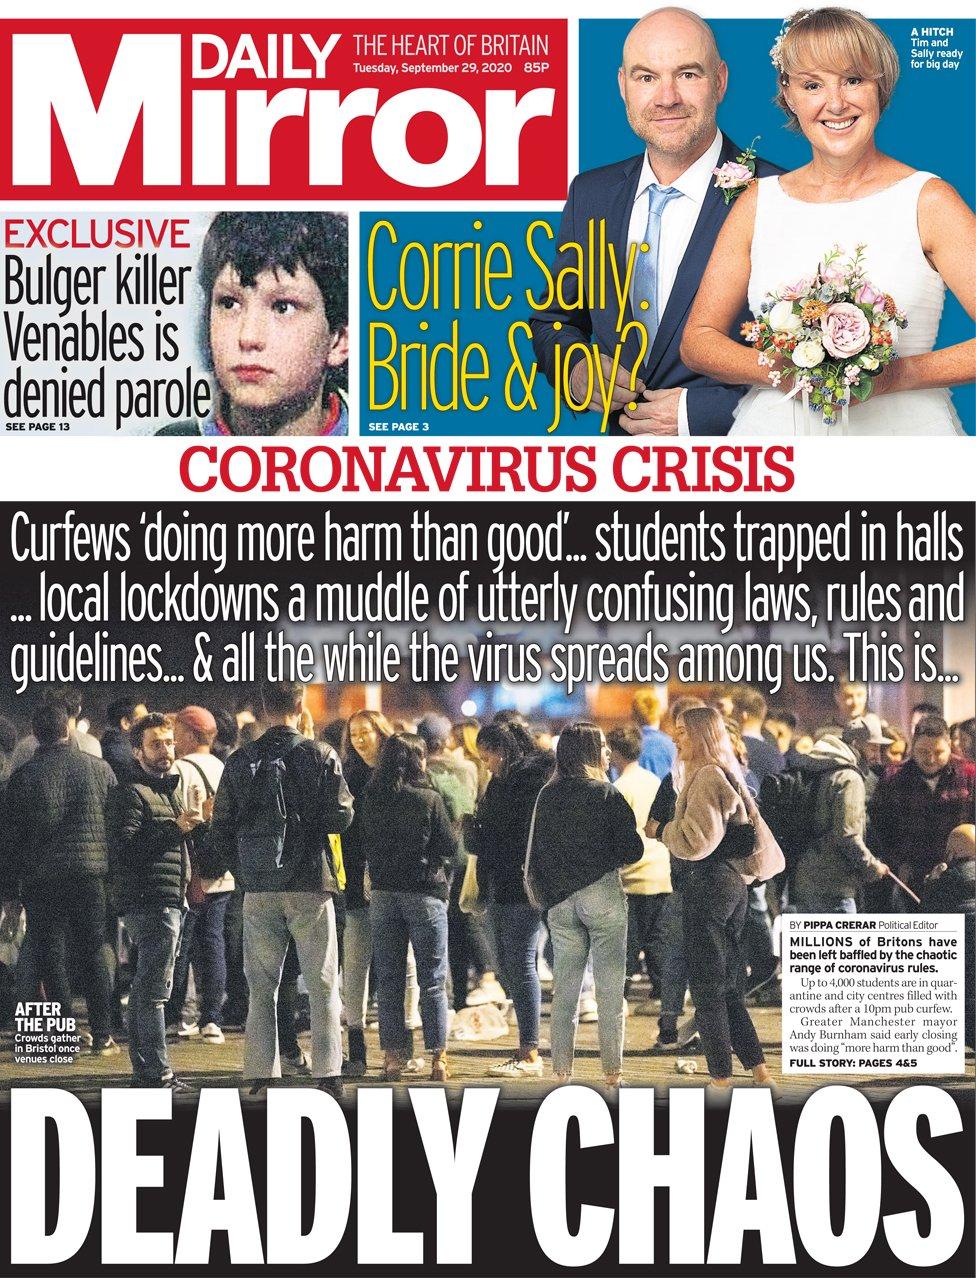 Daily Mirror 29 Sep